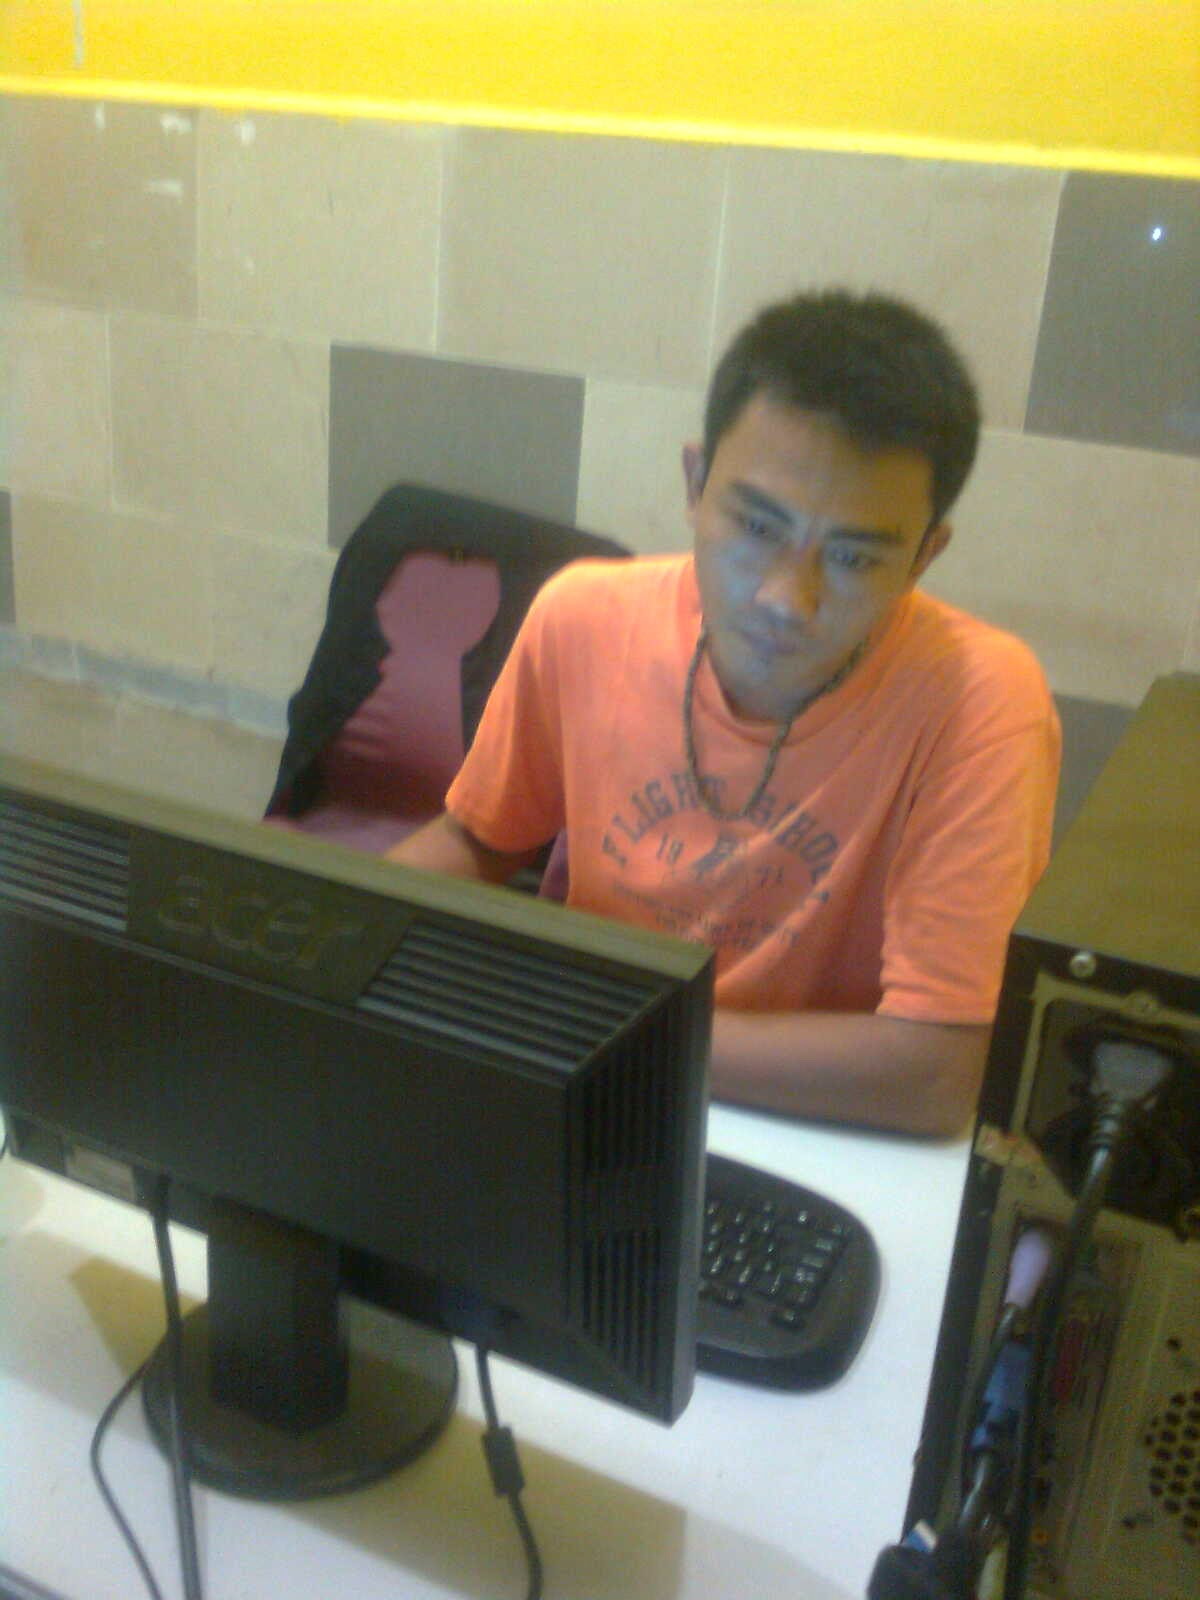 Angroy Caniago Google